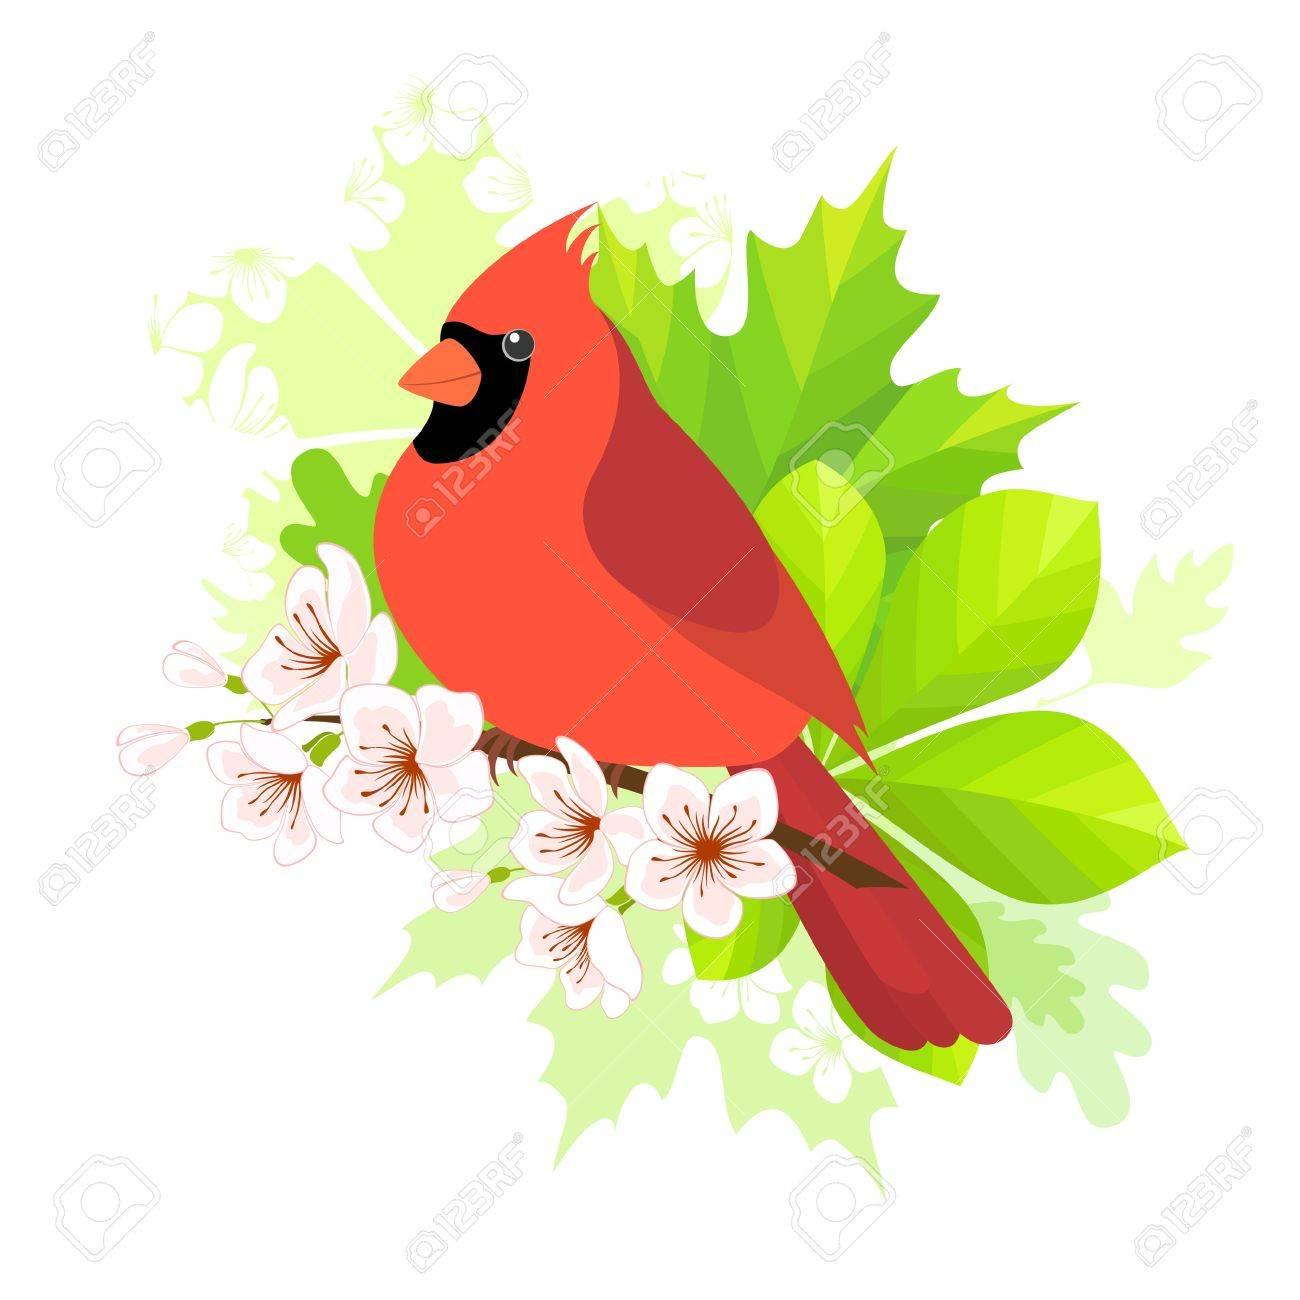 Pájaro Cardenal Sentado En Flor De Primavera Concepto De Rama De ...